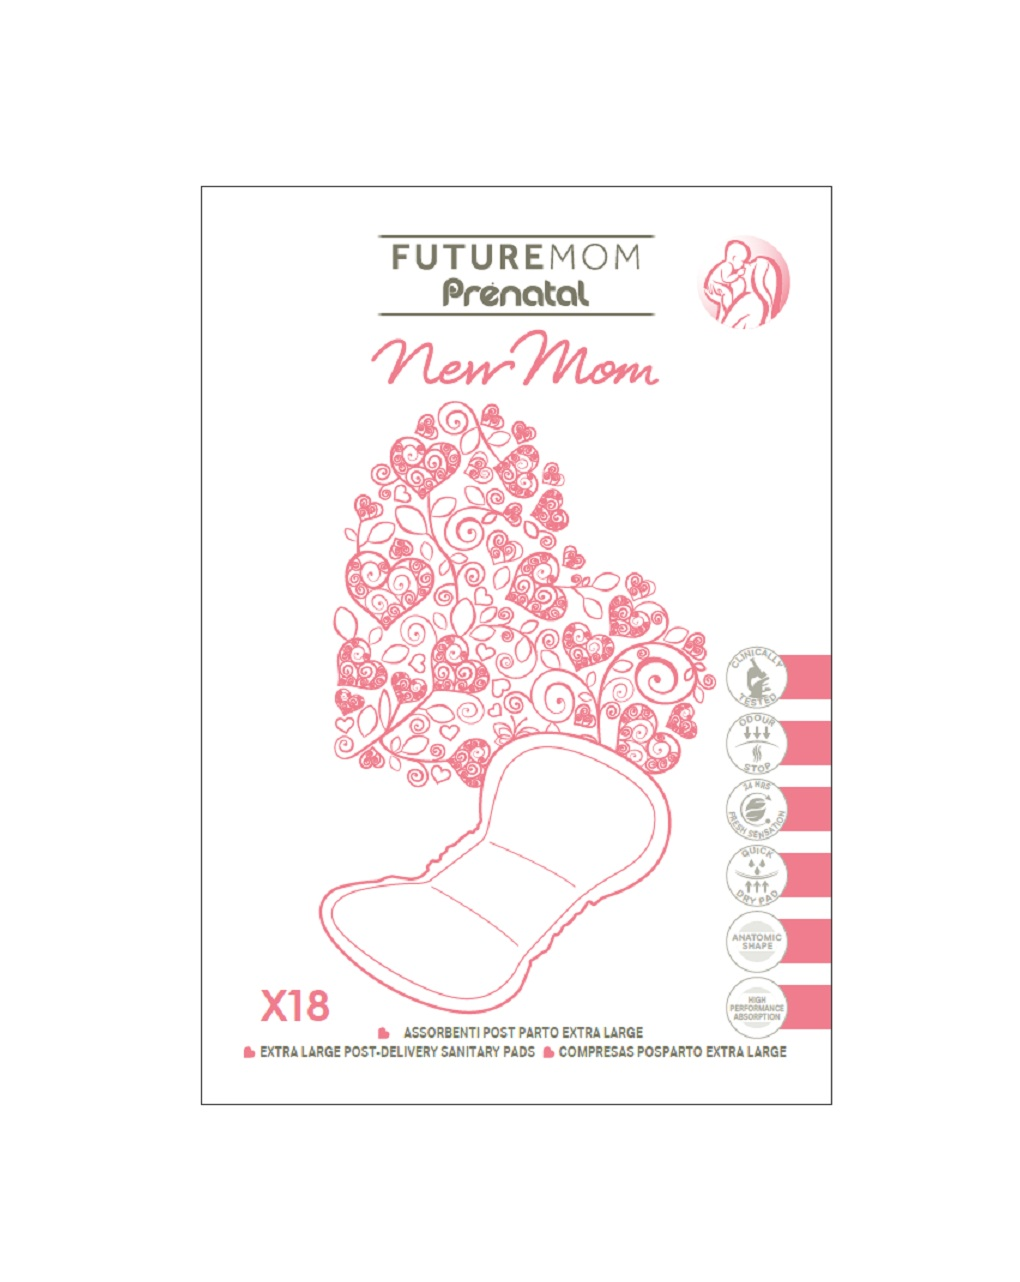 Compressas pós-parto extra grandes (18u.) - Prénatal, Prenatal 2